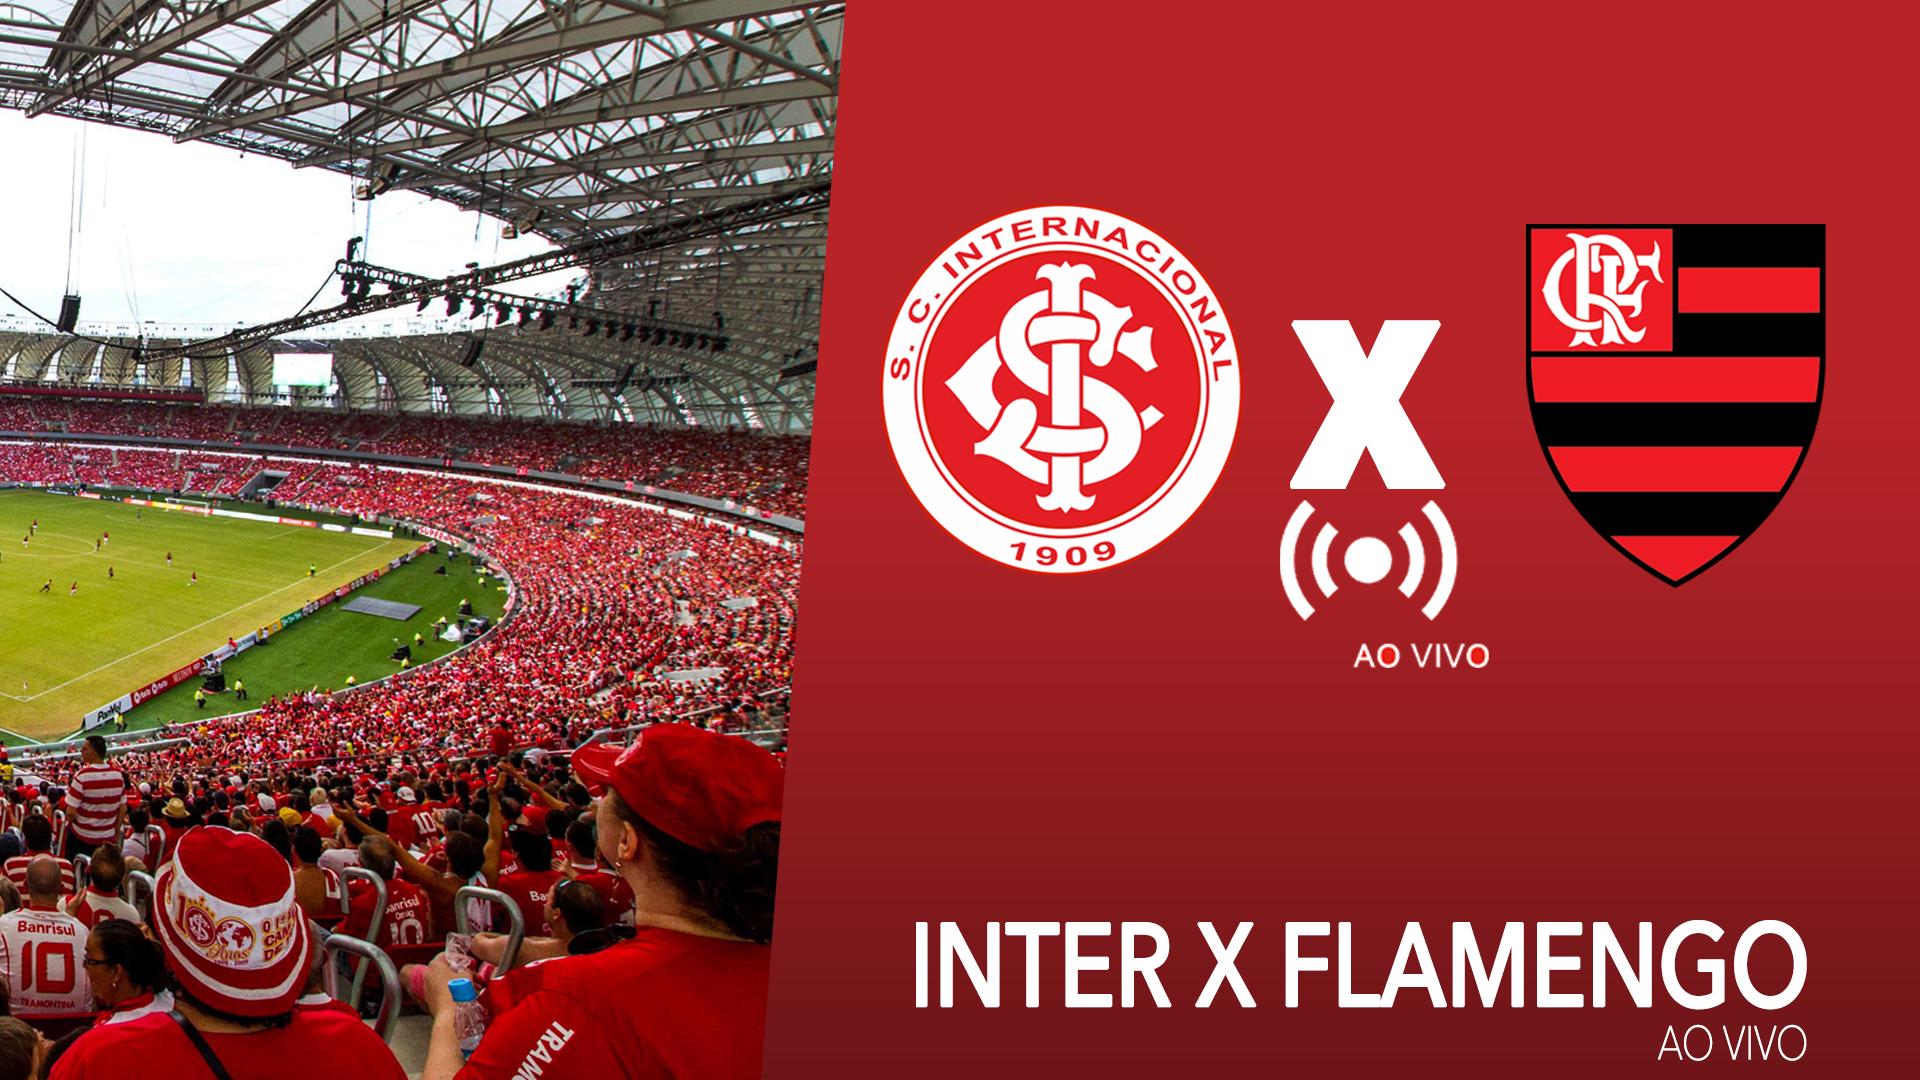 Inter x Flamengo ao vivo